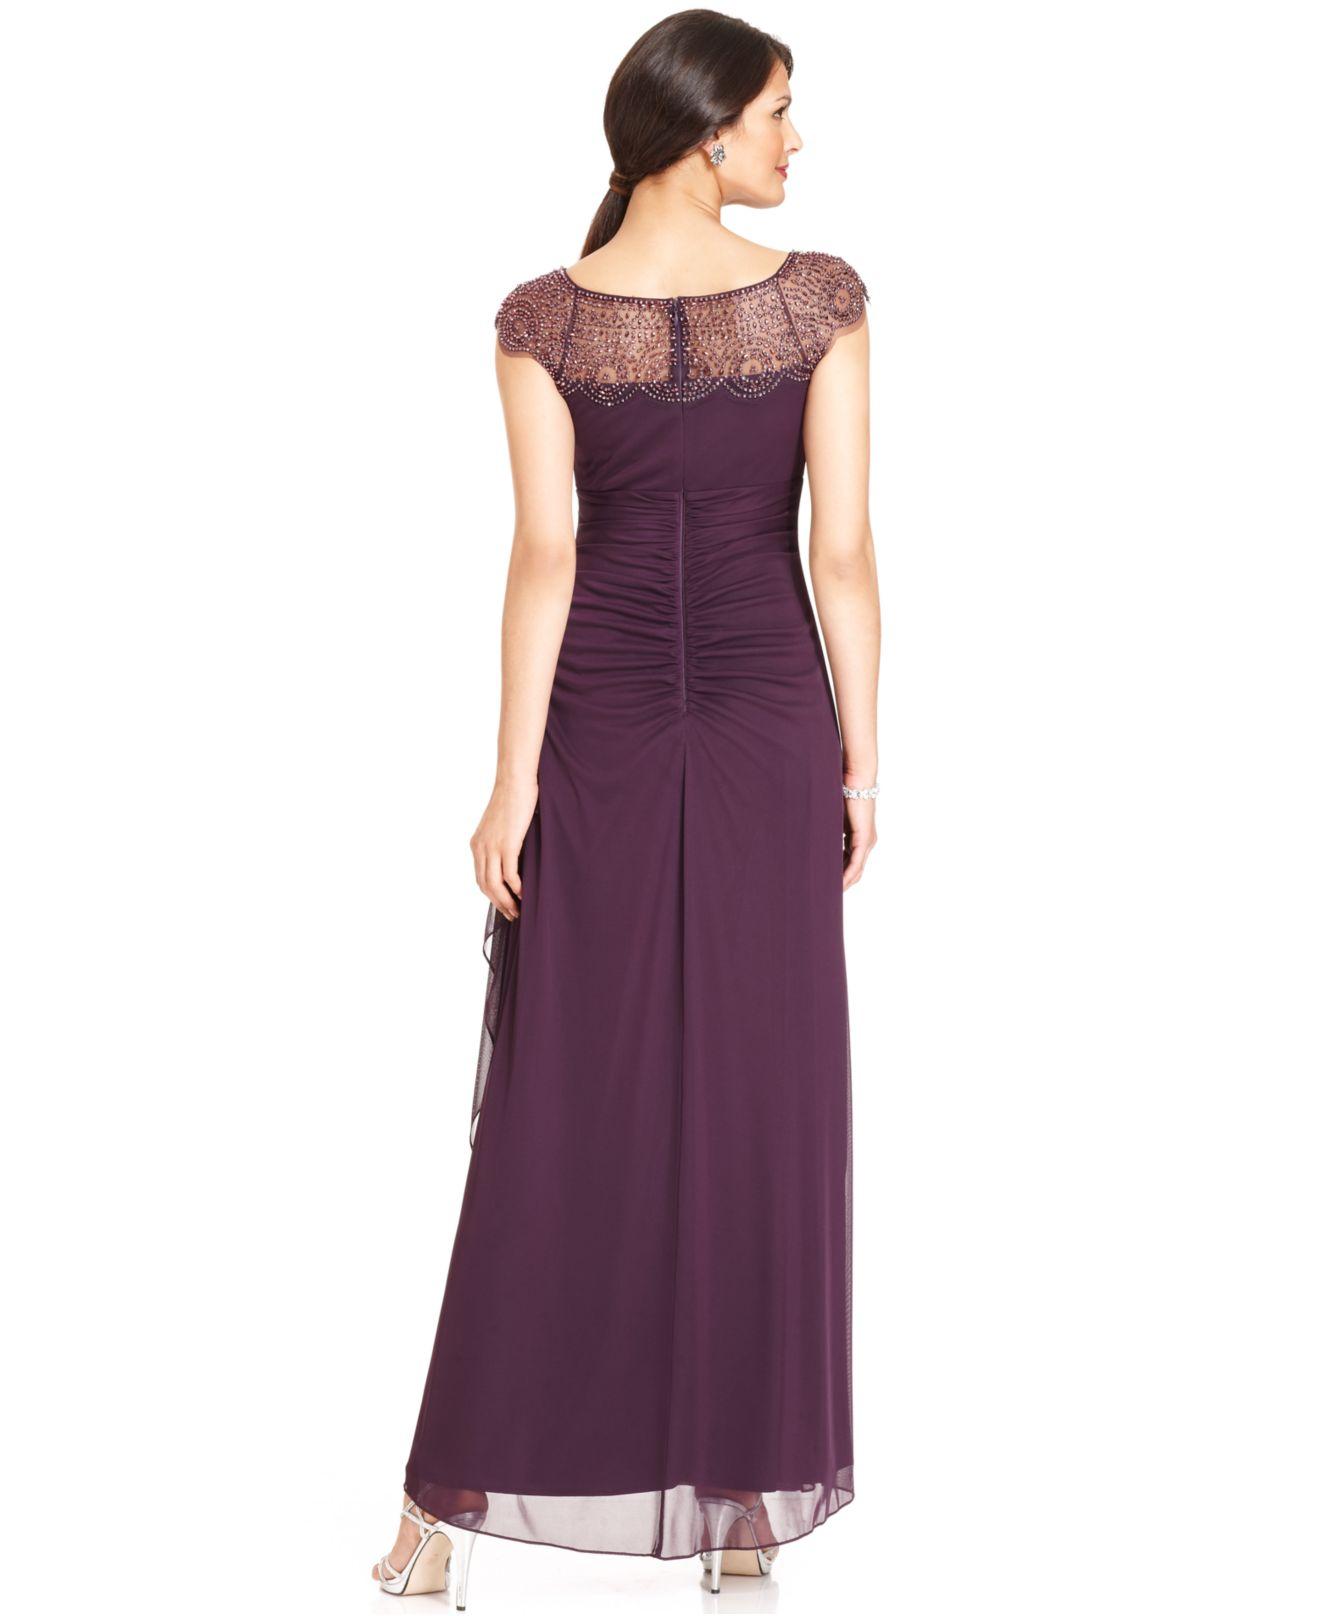 90da3133e Xscape Petite Cap-Sleeve Beaded Gown in Purple - Lyst